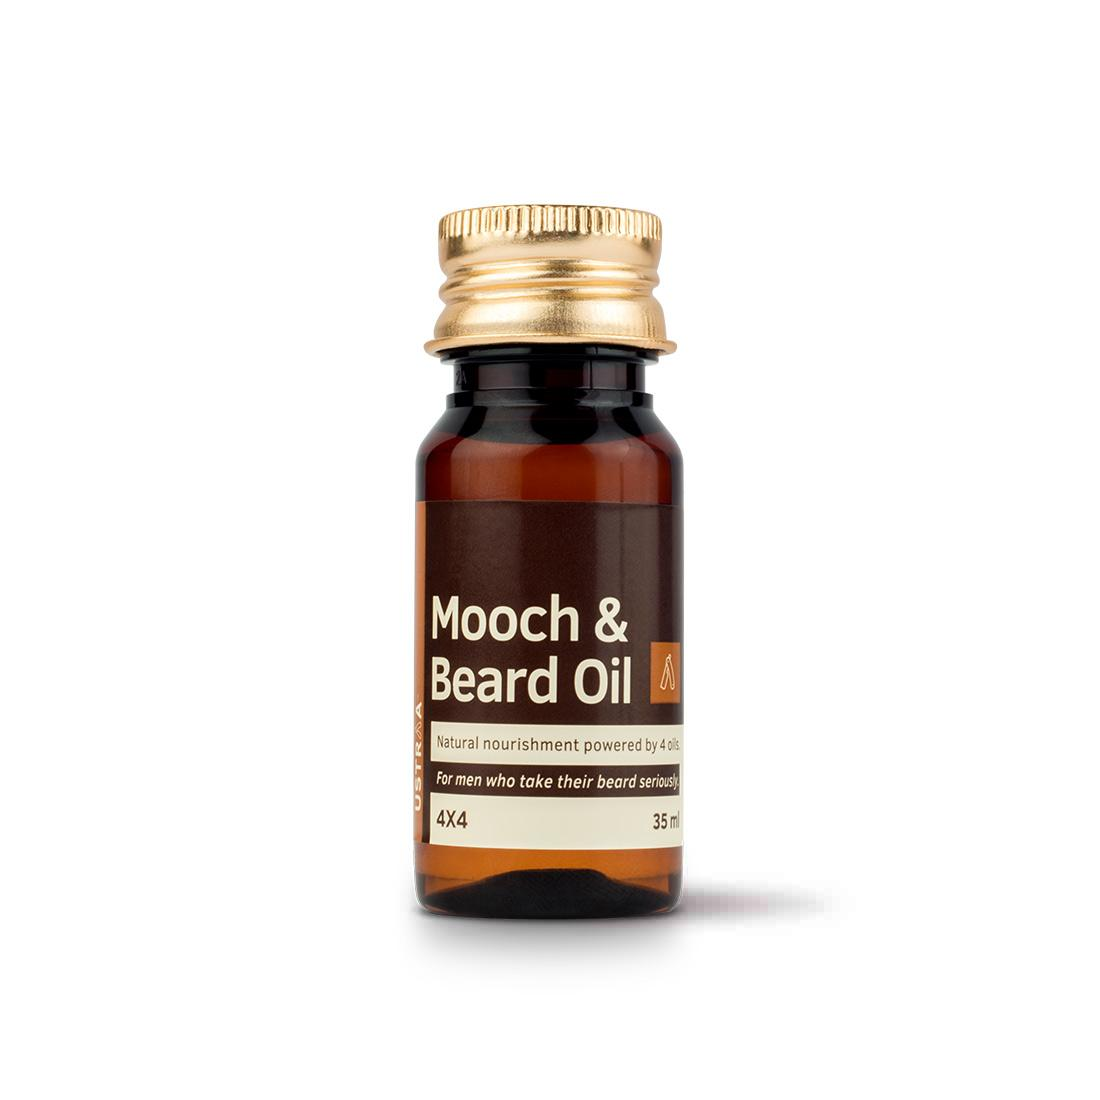 Ustraa Beard & Mooch Oil 4x4 - Mix of Natural Oils - Argan, Sunflower, Lemon, and Vitamin E for Complete Beard Health, Nourishment, and Repair - 35 ml